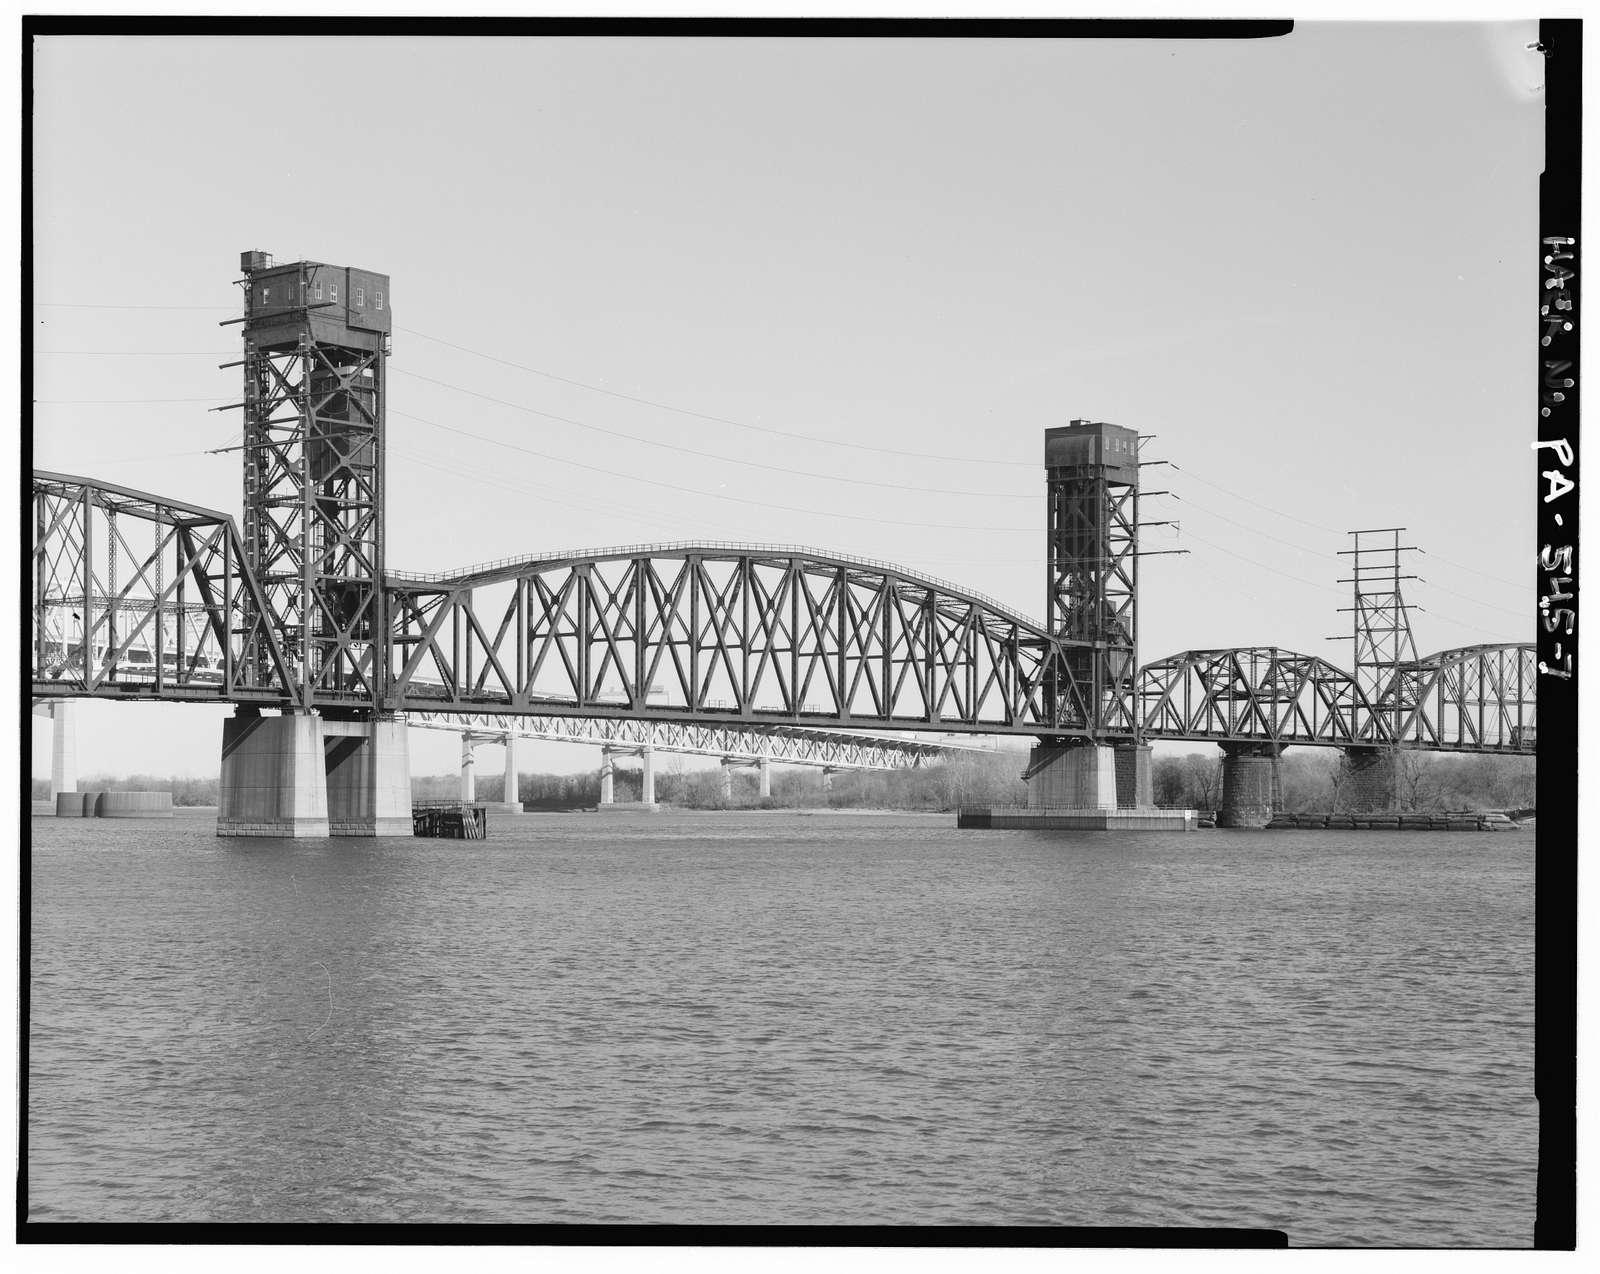 Pennsylvania & New Jersey Railroad, Delaware River Bridge, Spanning Delaware River, south of Betsy Ross Bridge (State Route 90), Philadelphia, Philadelphia County, PA